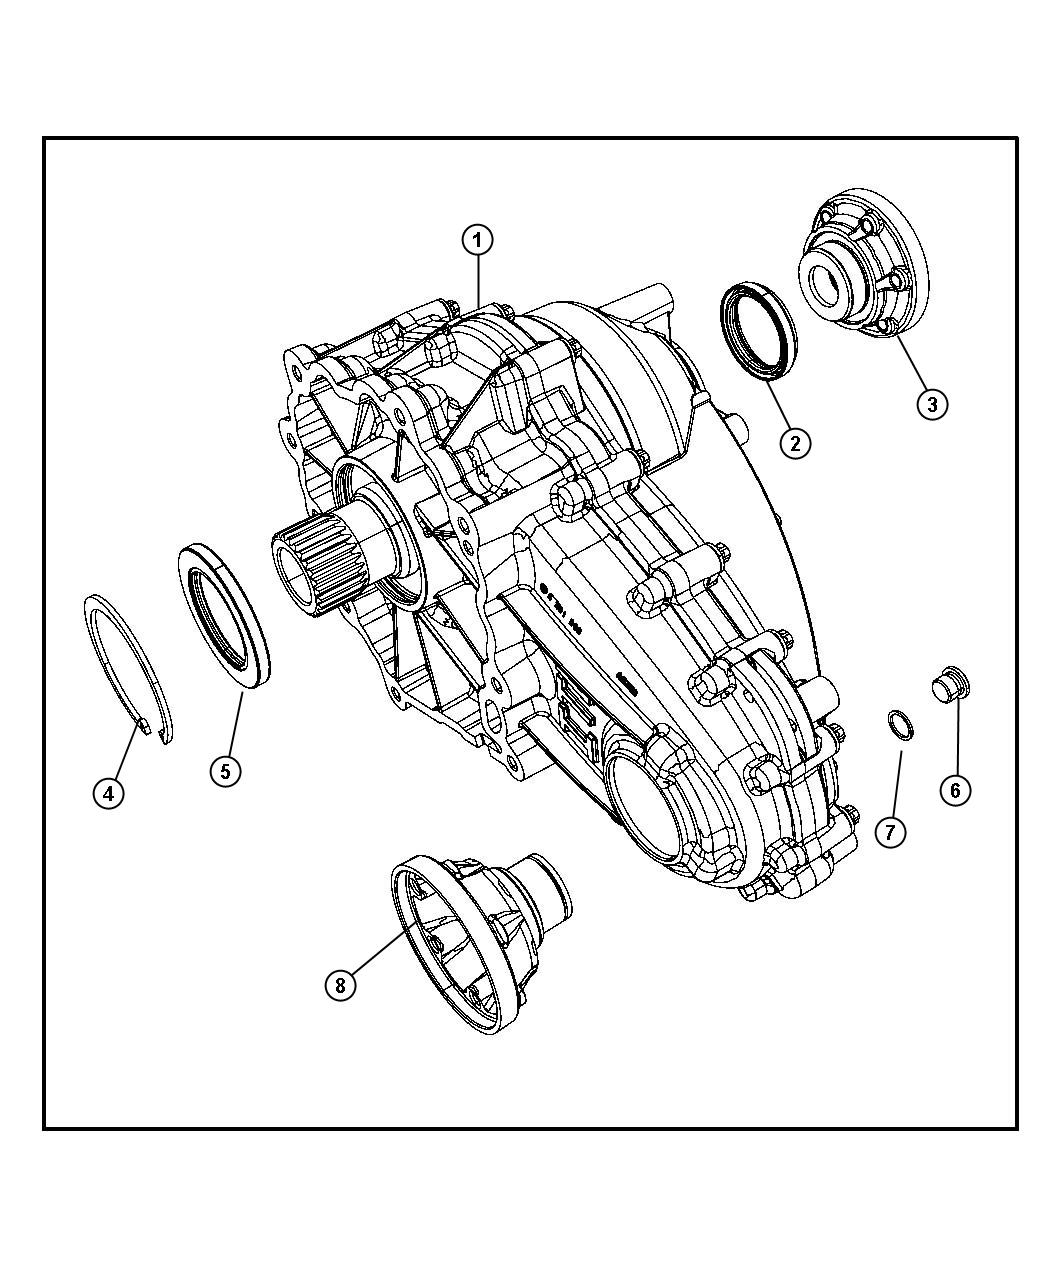 Jeep Grand Cherokee Transfer Case Itc